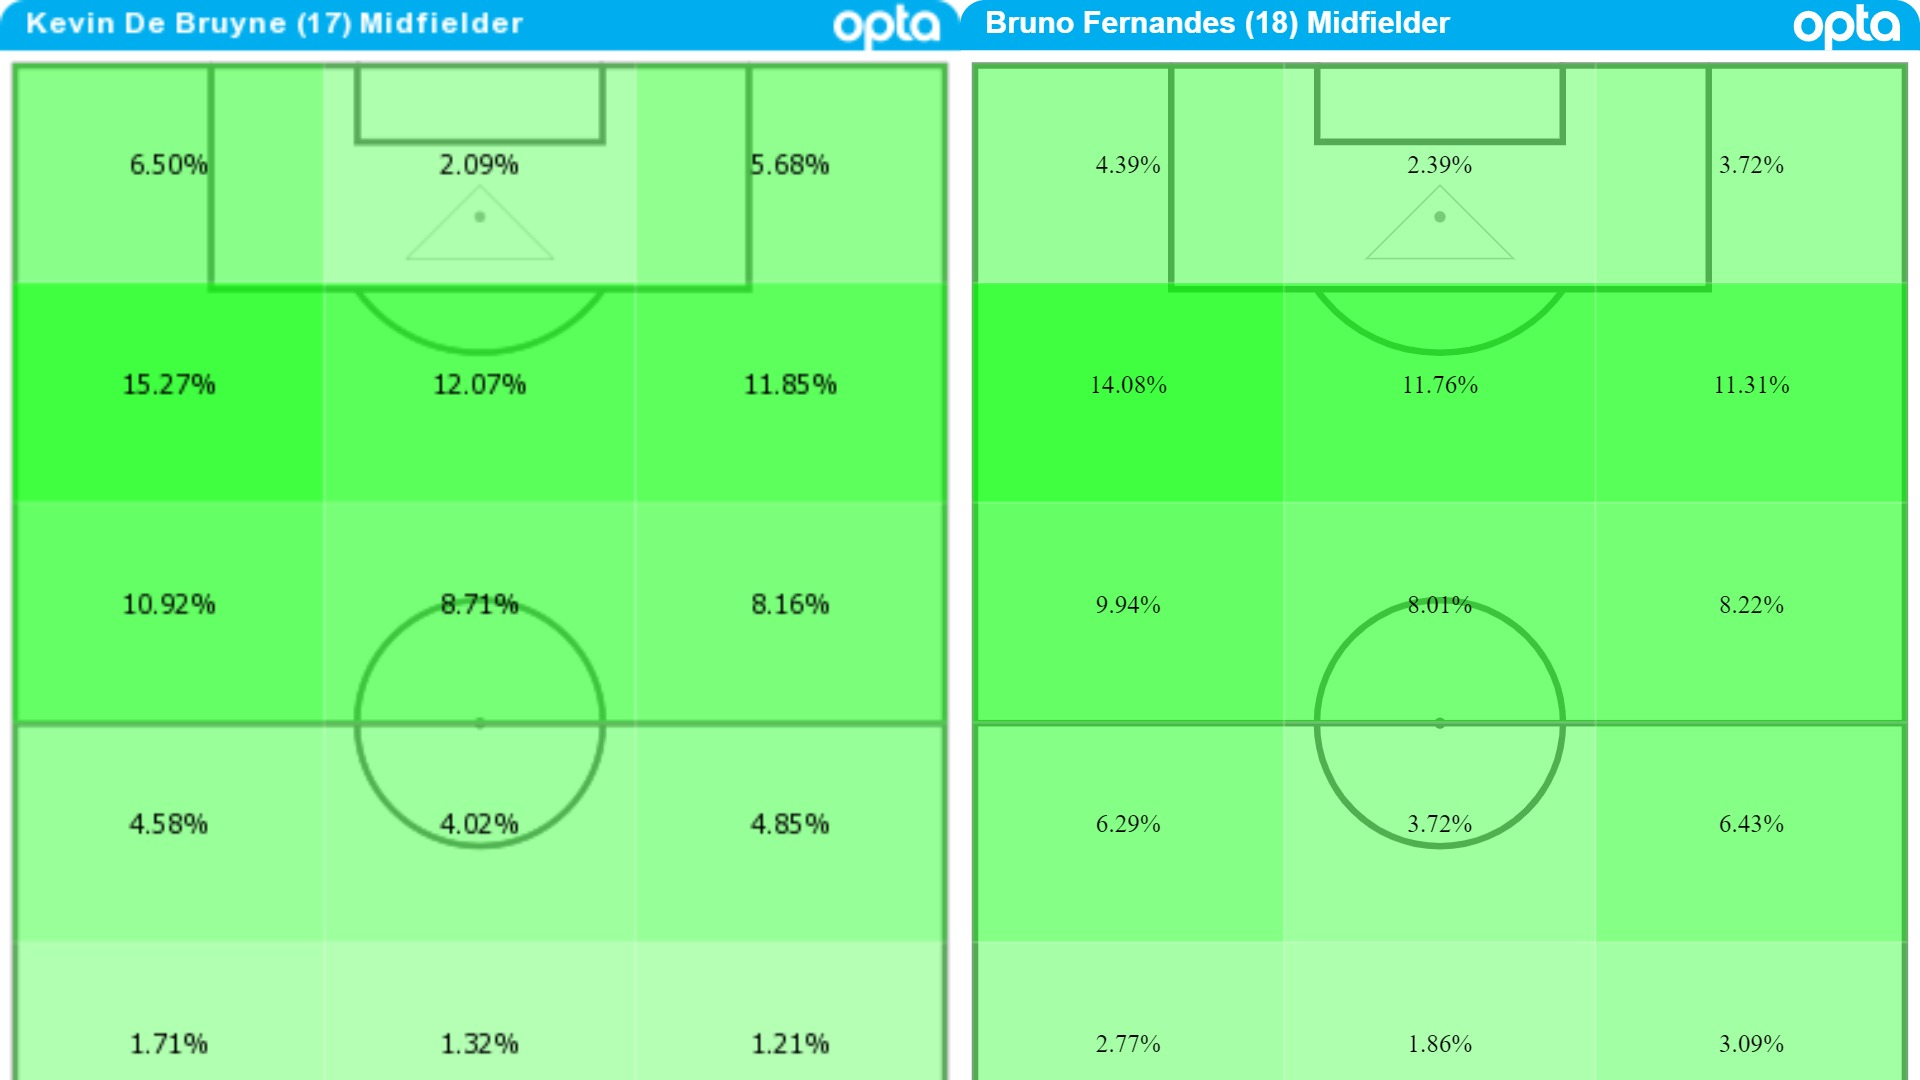 Kevin De Bruyne and Bruno Fernandes Premier League 2020-21 touchmaps